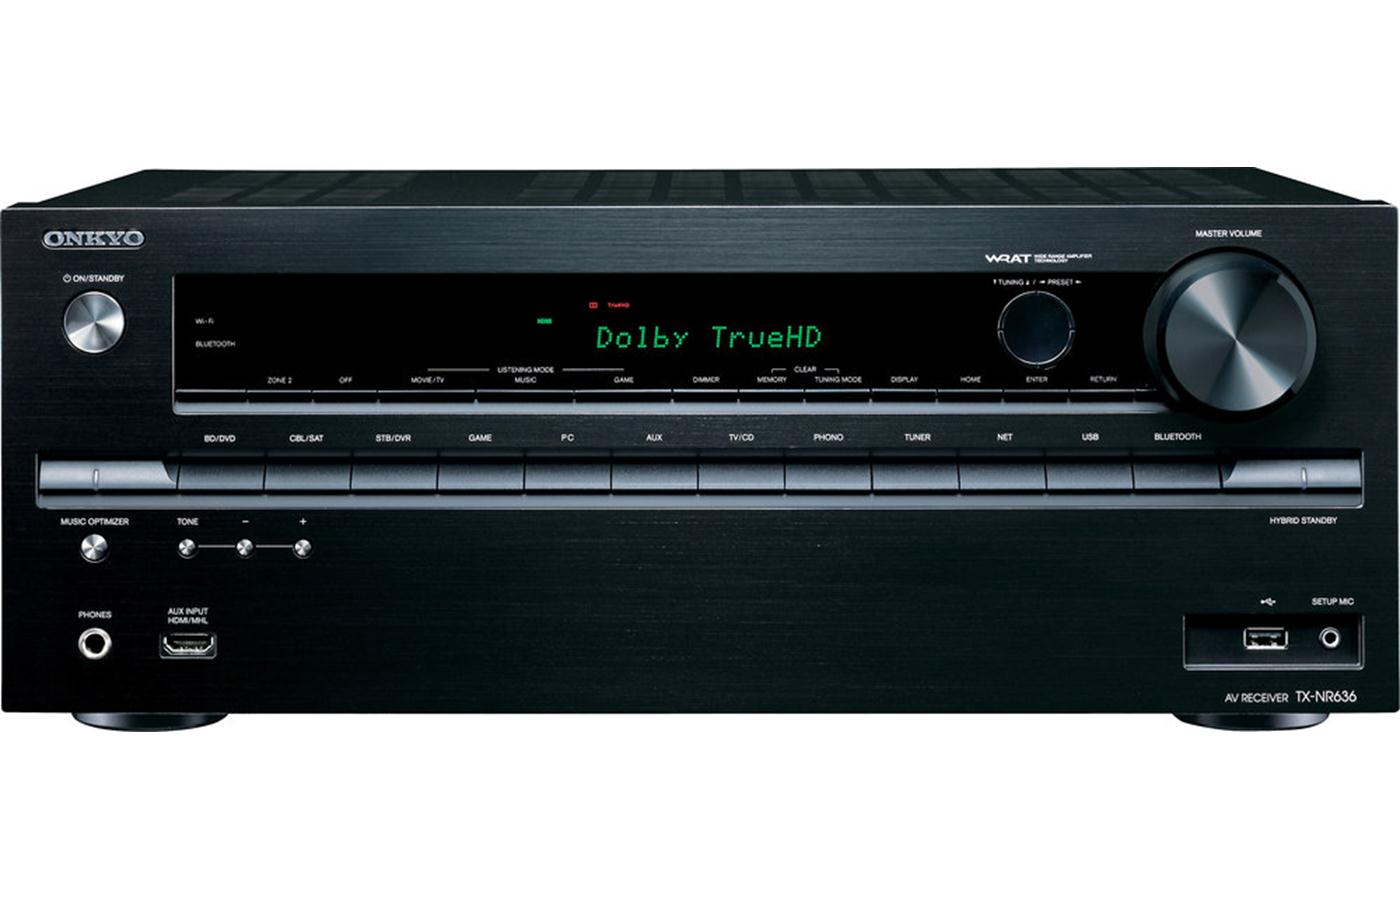 Onkyo TX-NR636 Vs Denon AVR-S900W